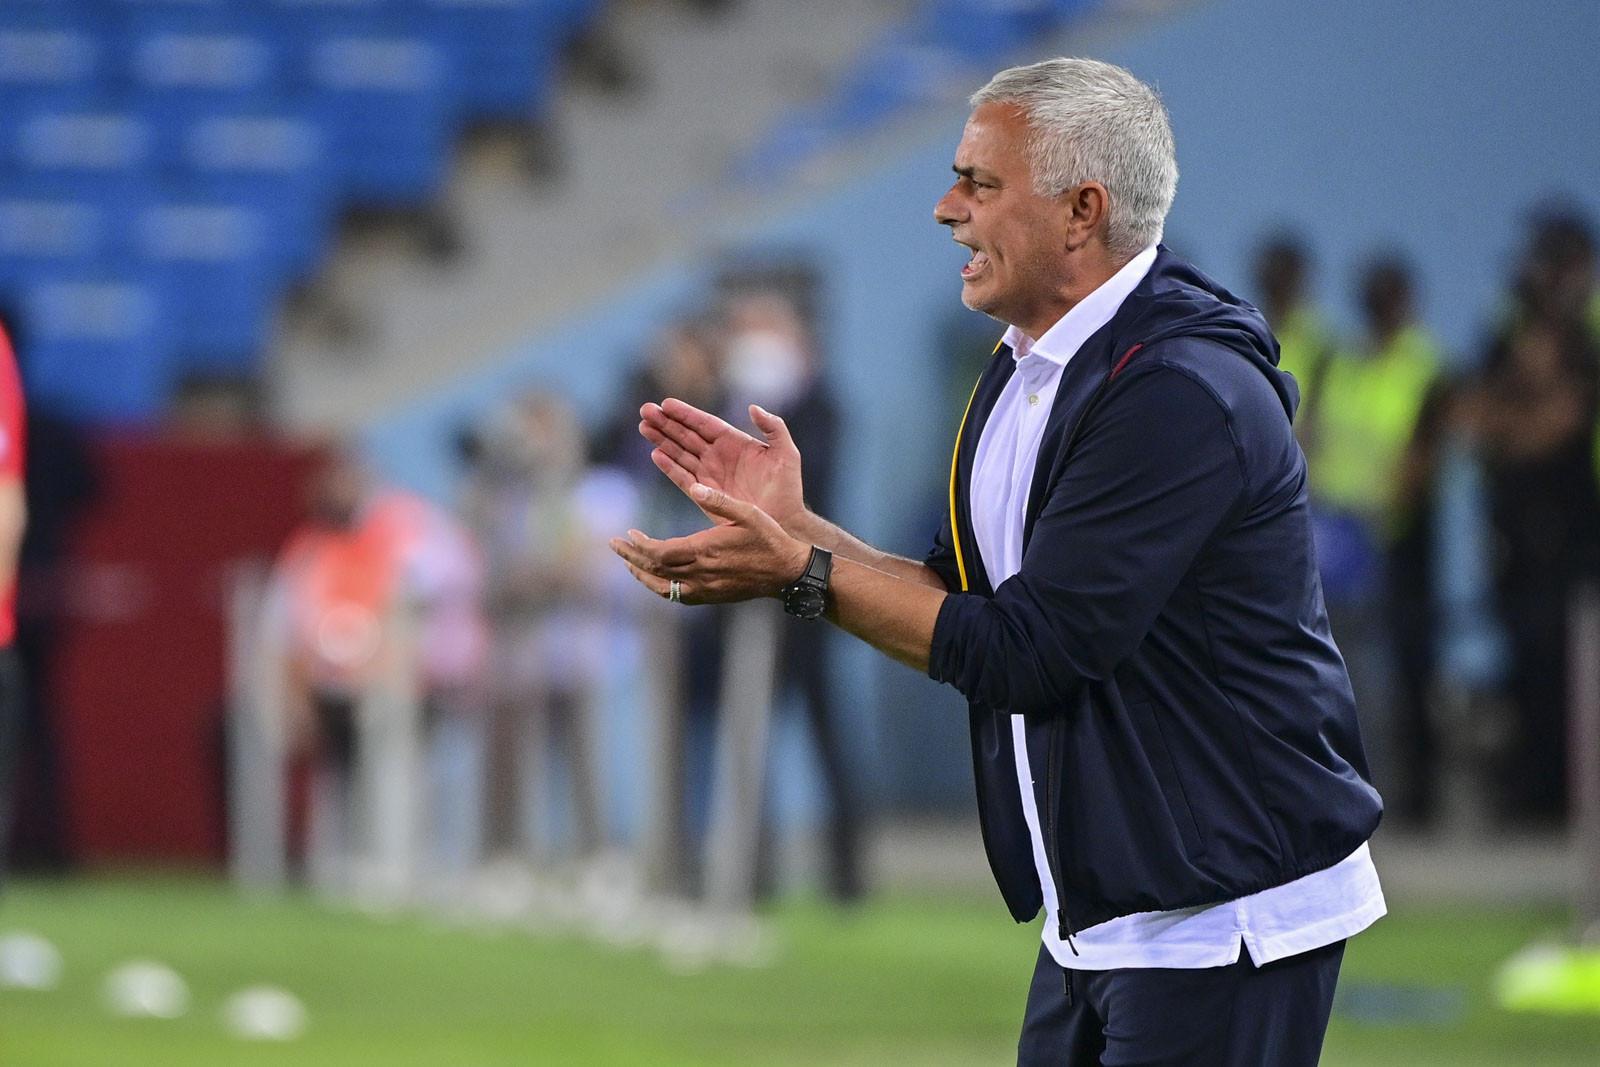 AS Roma Takluk di Tangan Hellas Verona, Jose Mourinho Puji Manajer Rival - JPNN.com